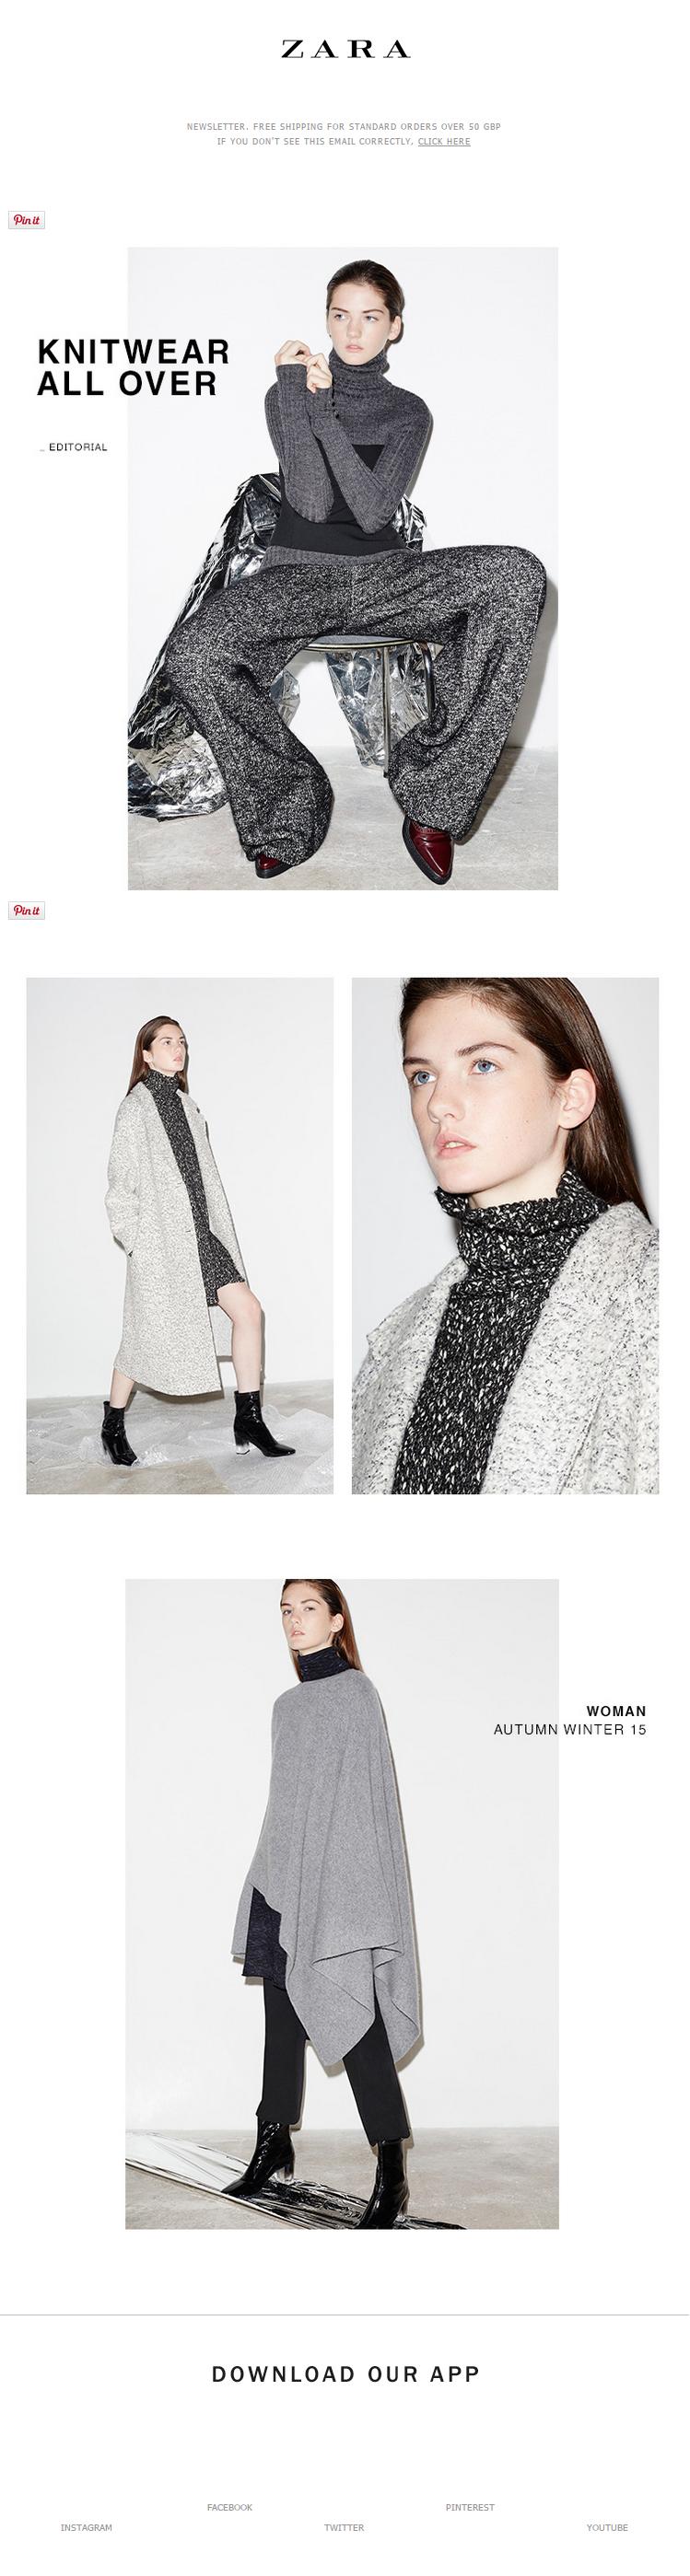 Zara Newsletter